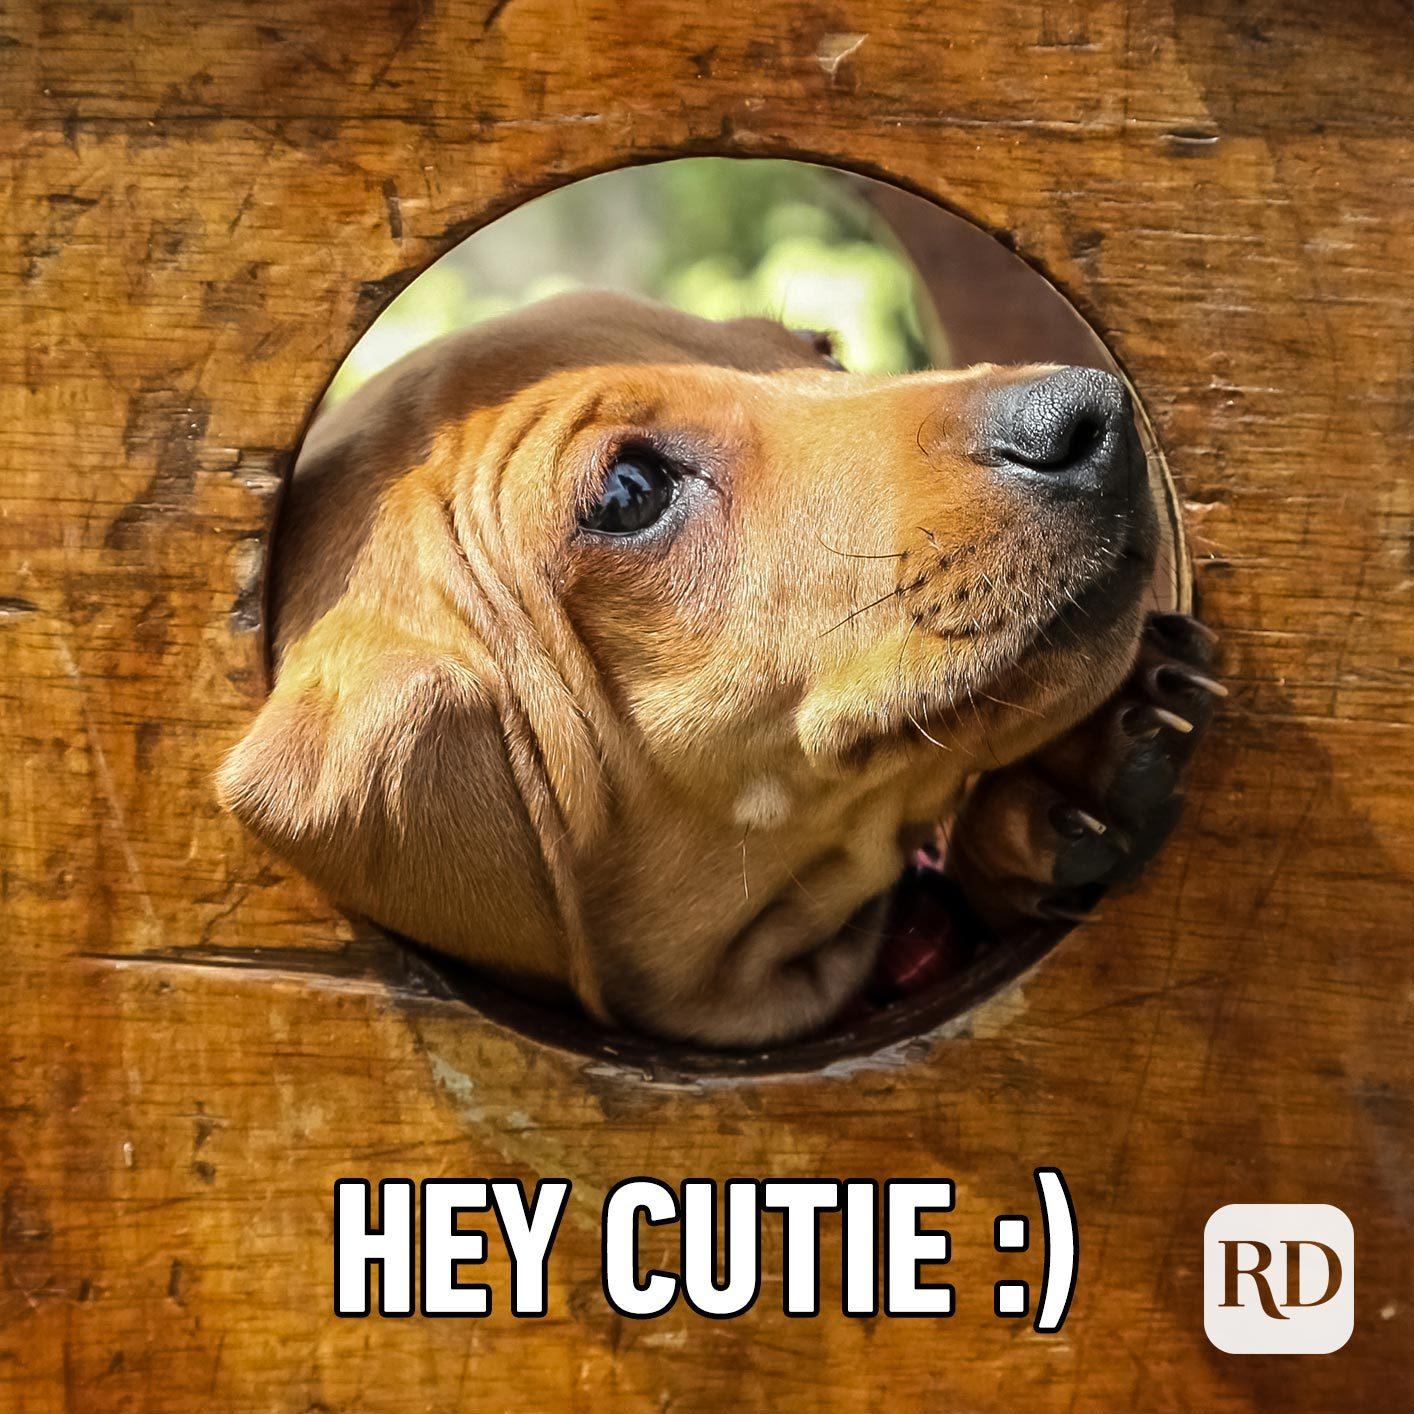 Dog peeking out of hole. Meme text: Hey cutie :)